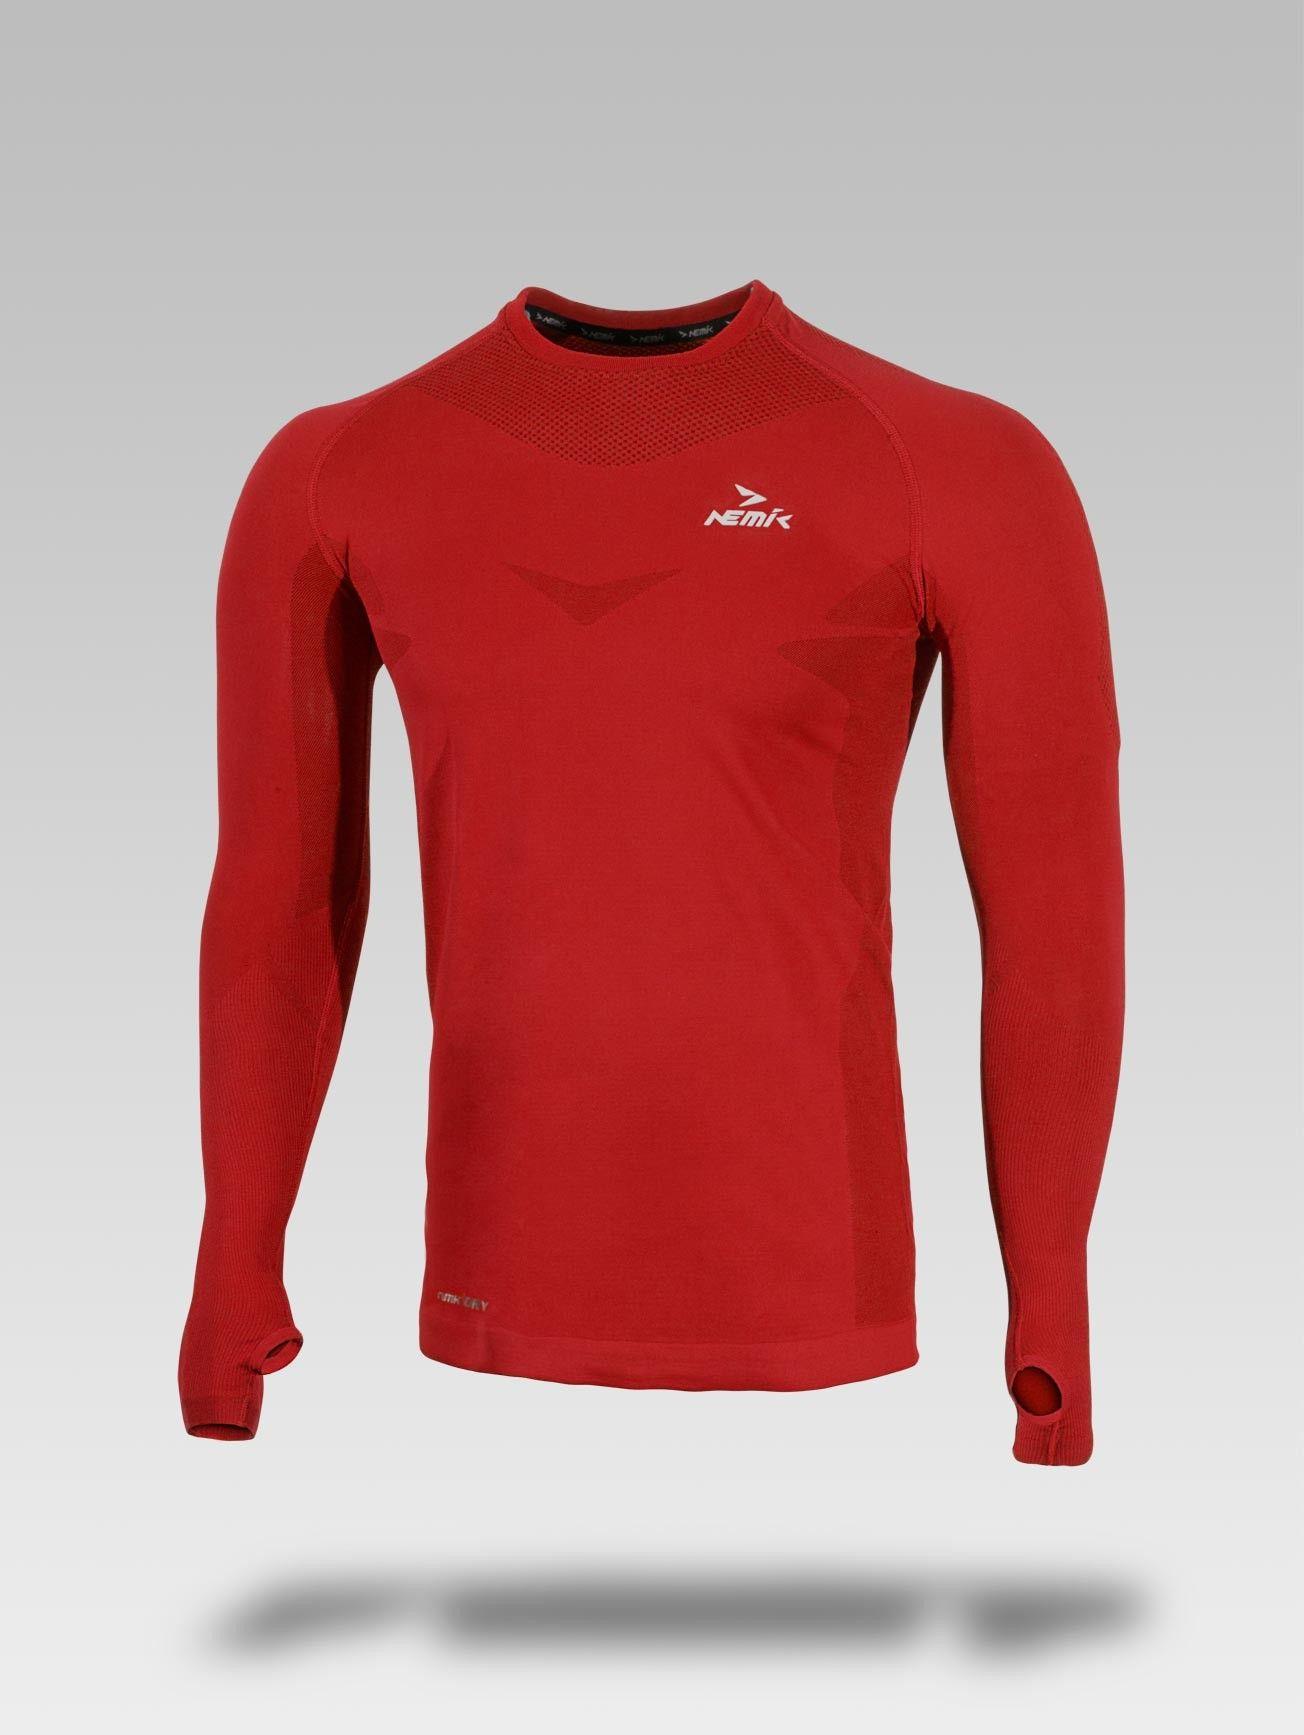 PLAYERA DEPORTIVA MANGA LARGA CABALLERO Nemik  longsleeve  tshirt  red   Nemik ff3b840e2bb00